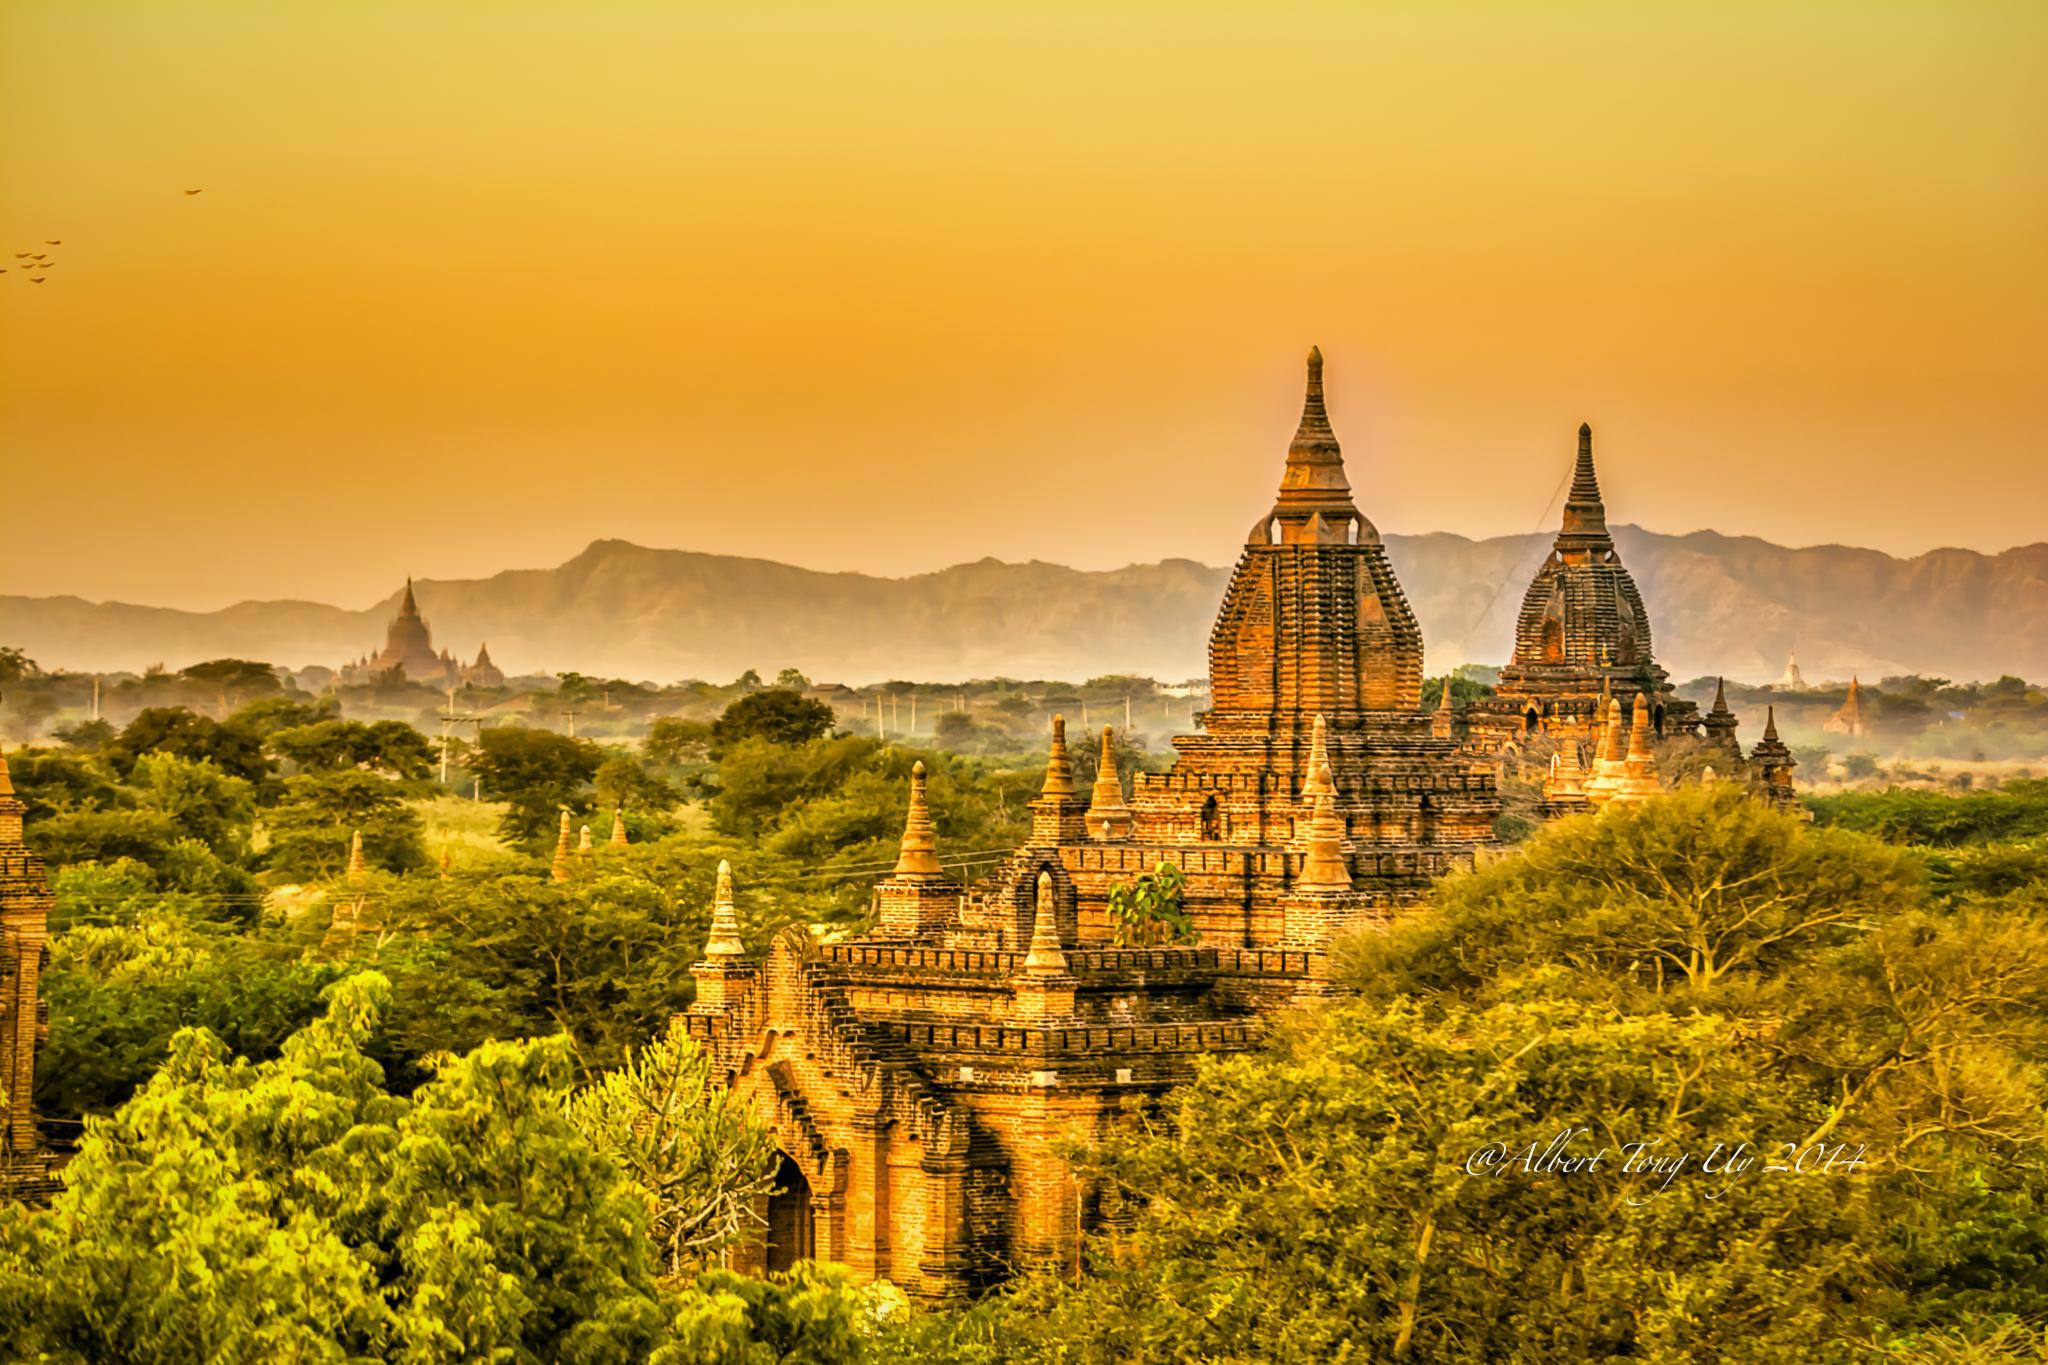 Sunrise at the Temple of Bagan, Myanmar,  photo 79 by iatu8888